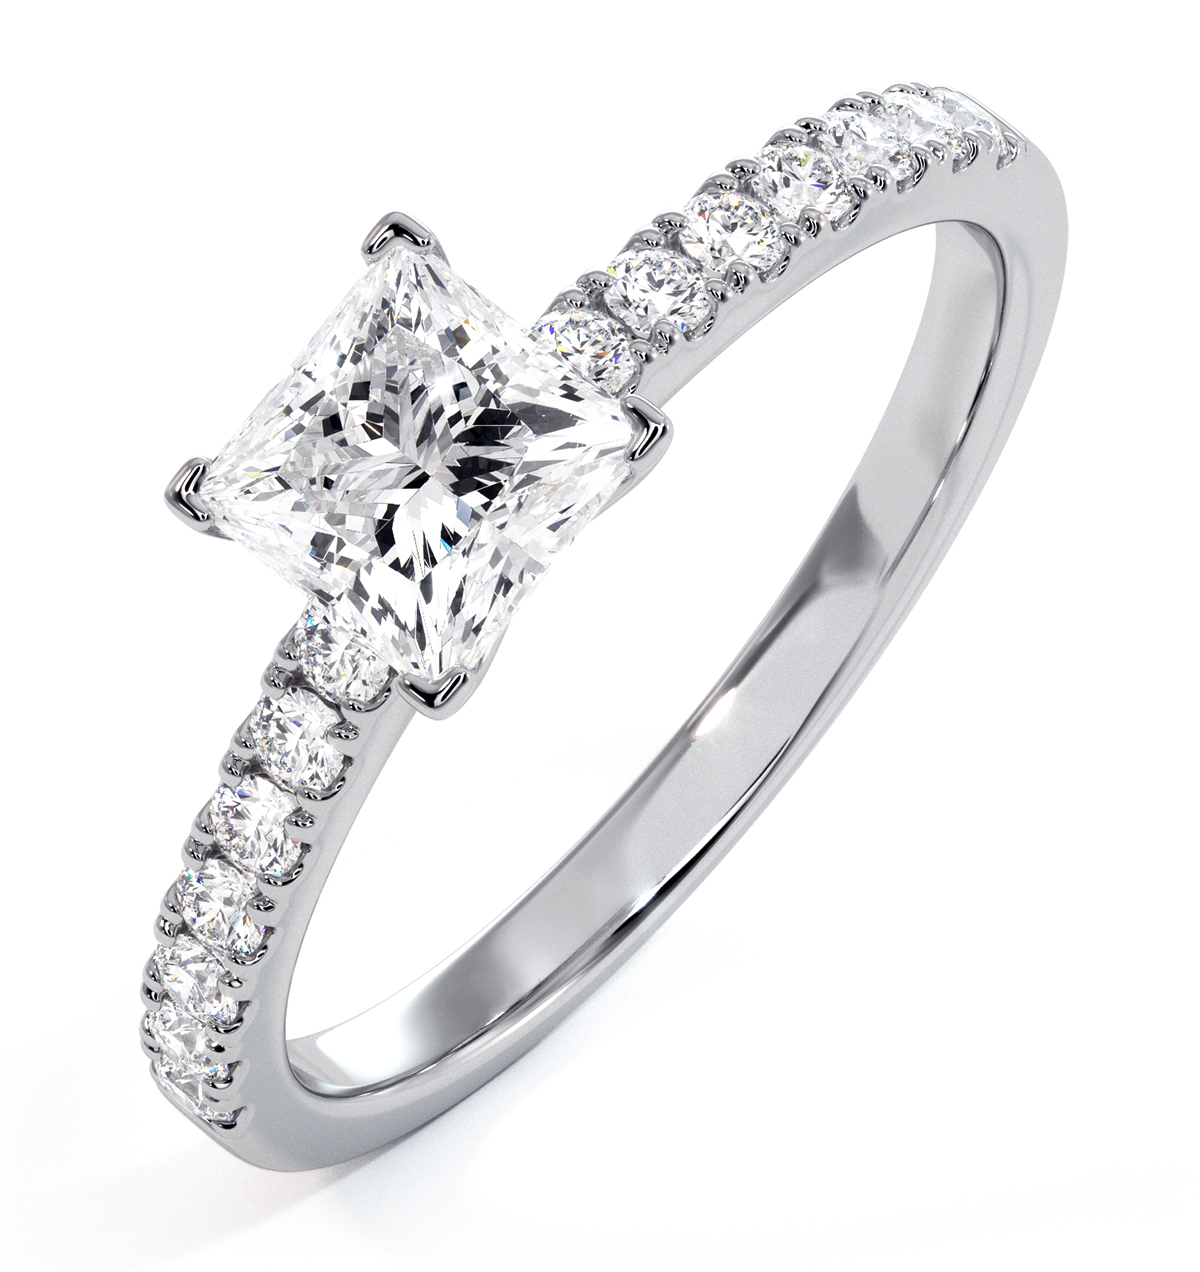 Katerina GIA Princess Diamond Engagement Ring Platinum 1.15ct G/VS1 - image 1